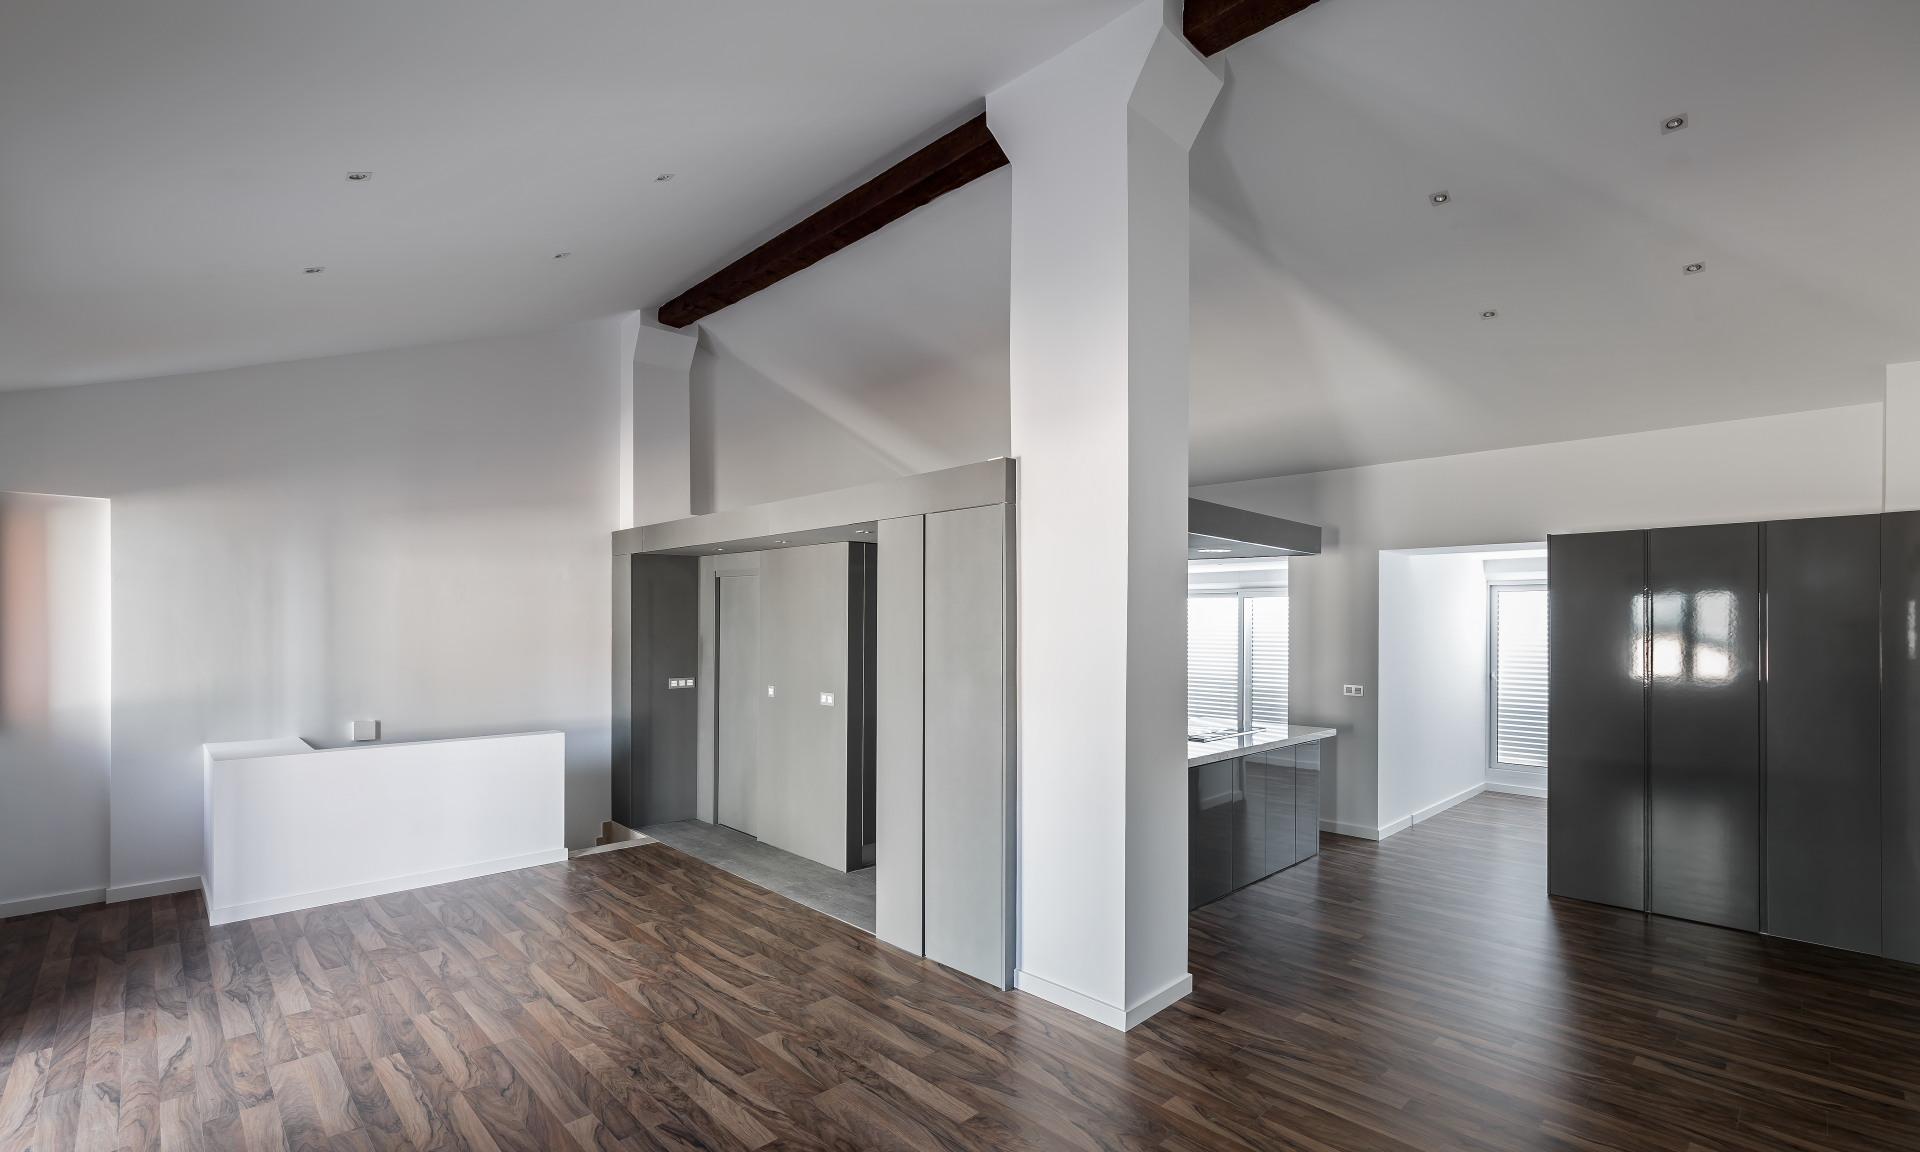 fotografia-arquitectura-valencia-german-cabo-viraje-reforma-campanar (6)